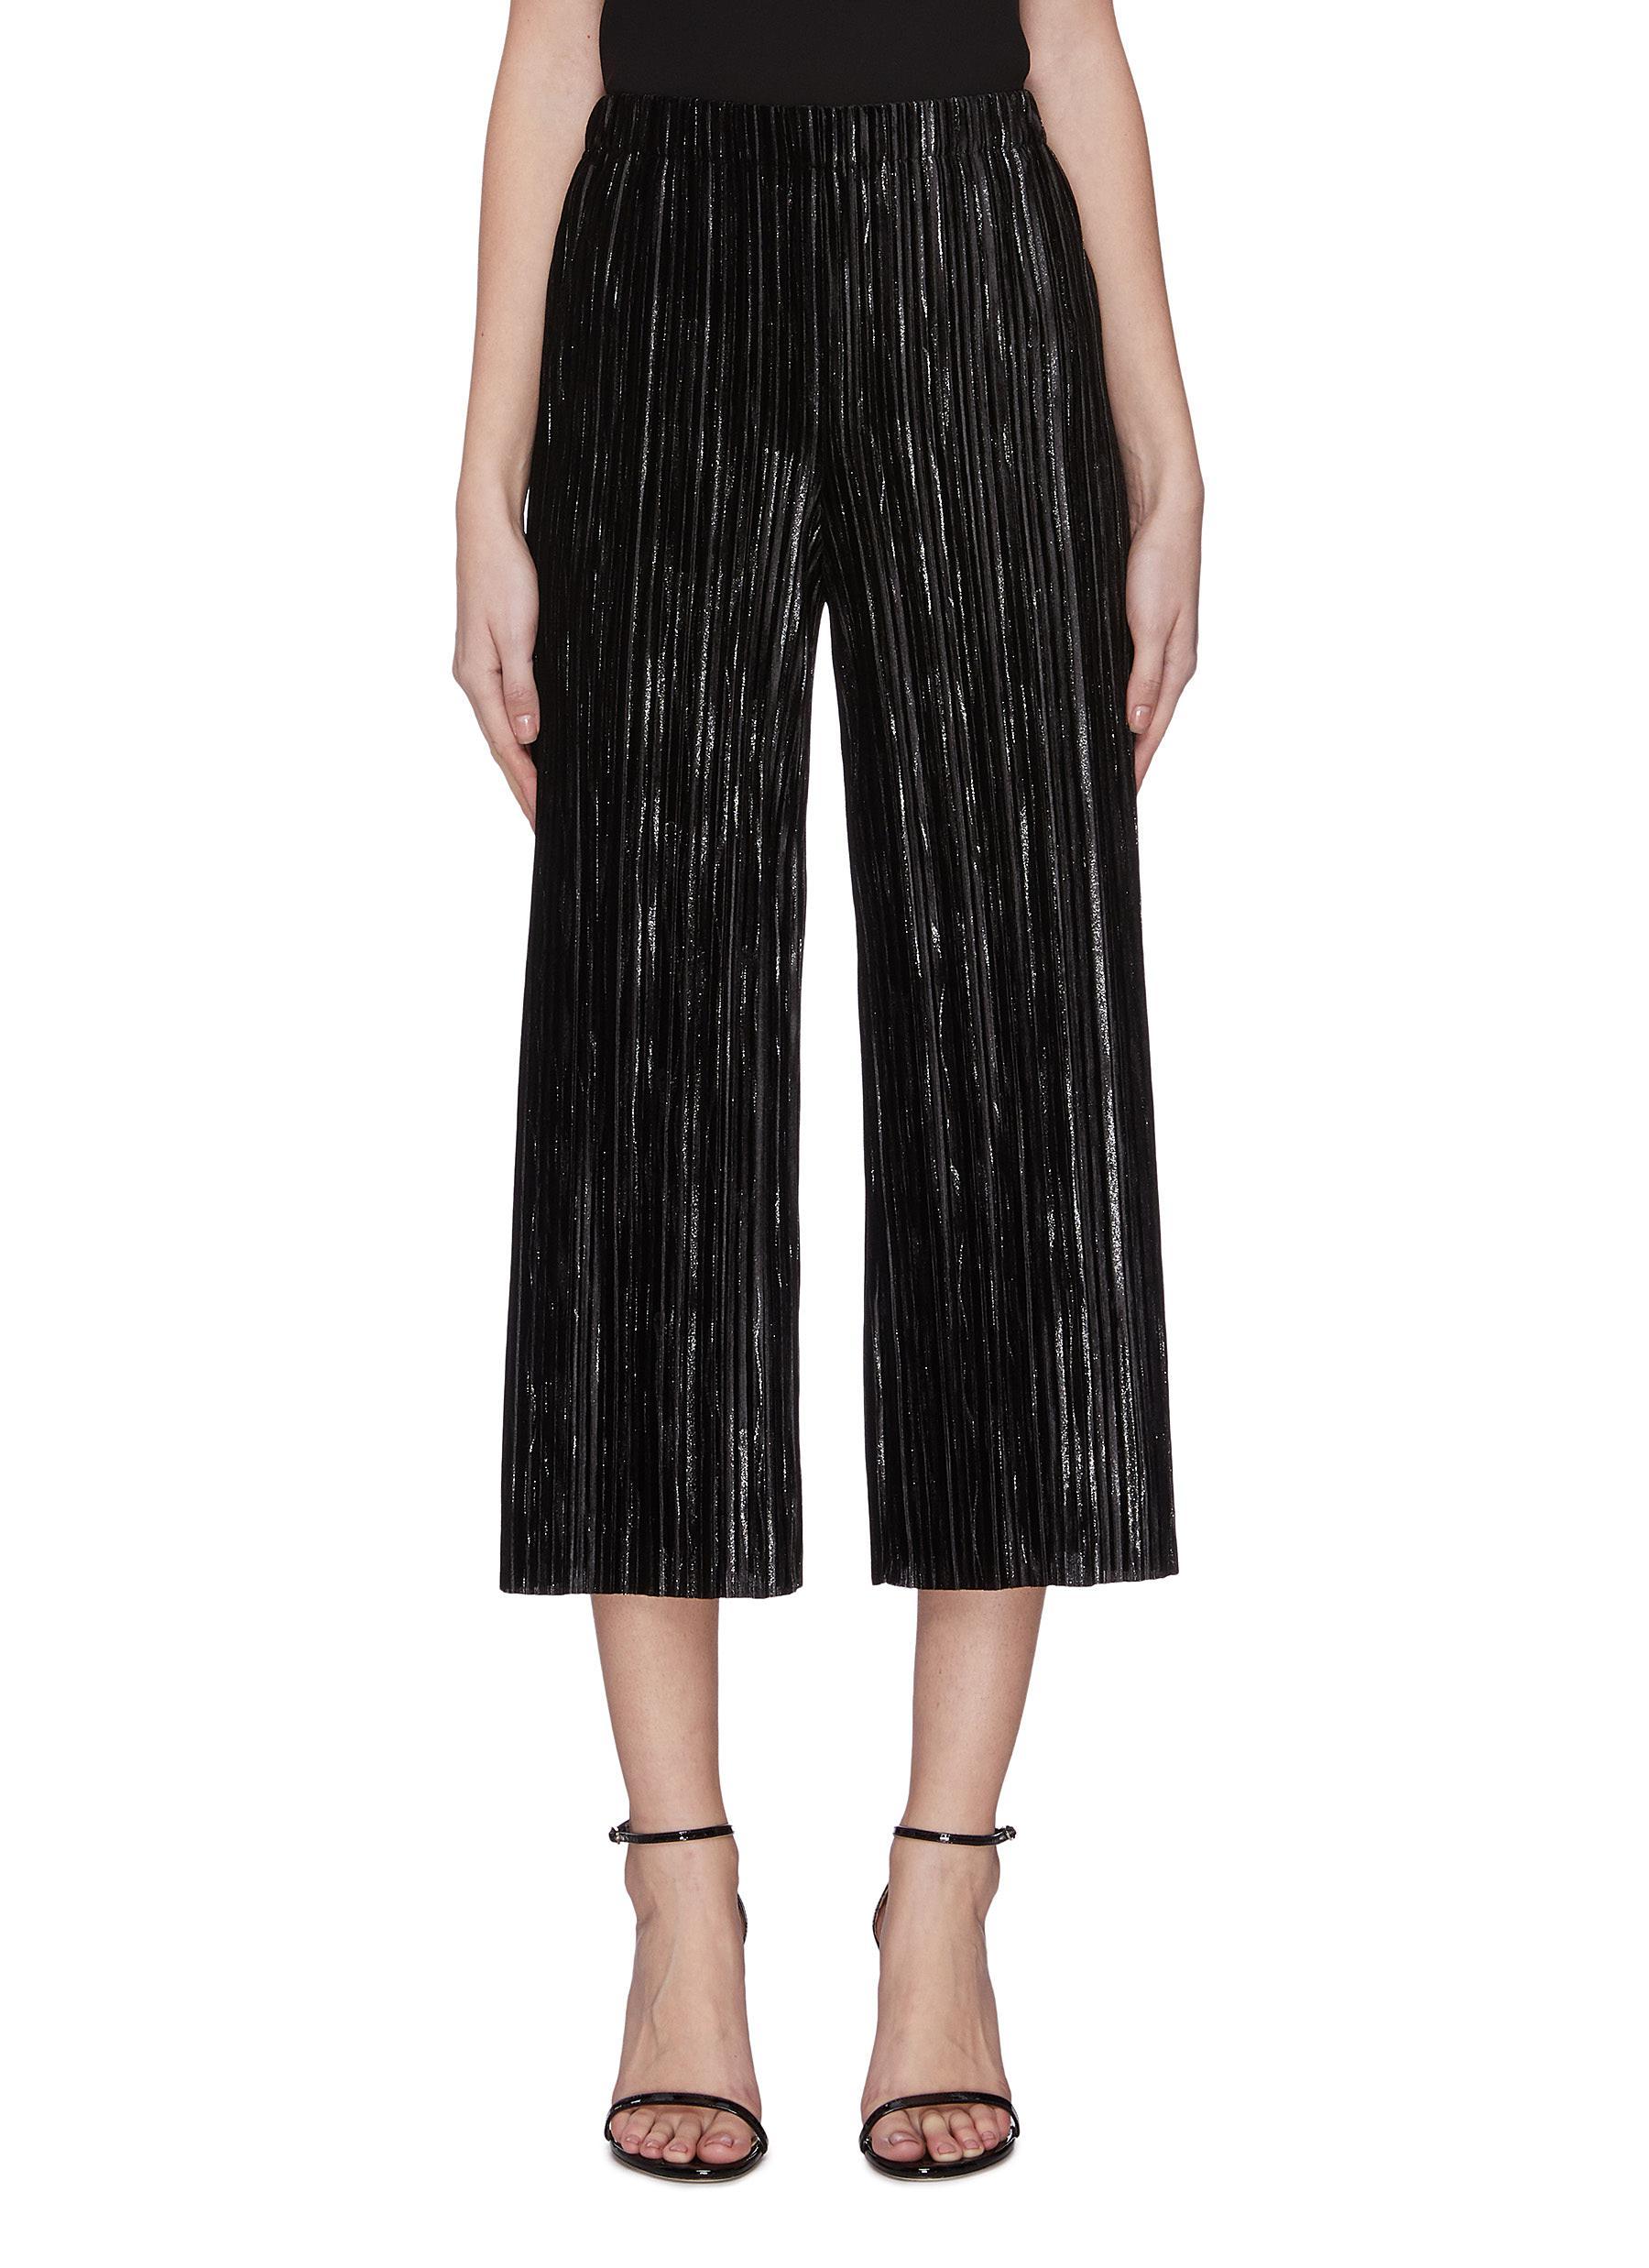 Buy Alice + Olivia Pants & Shorts 'Elba' pleated crop pants